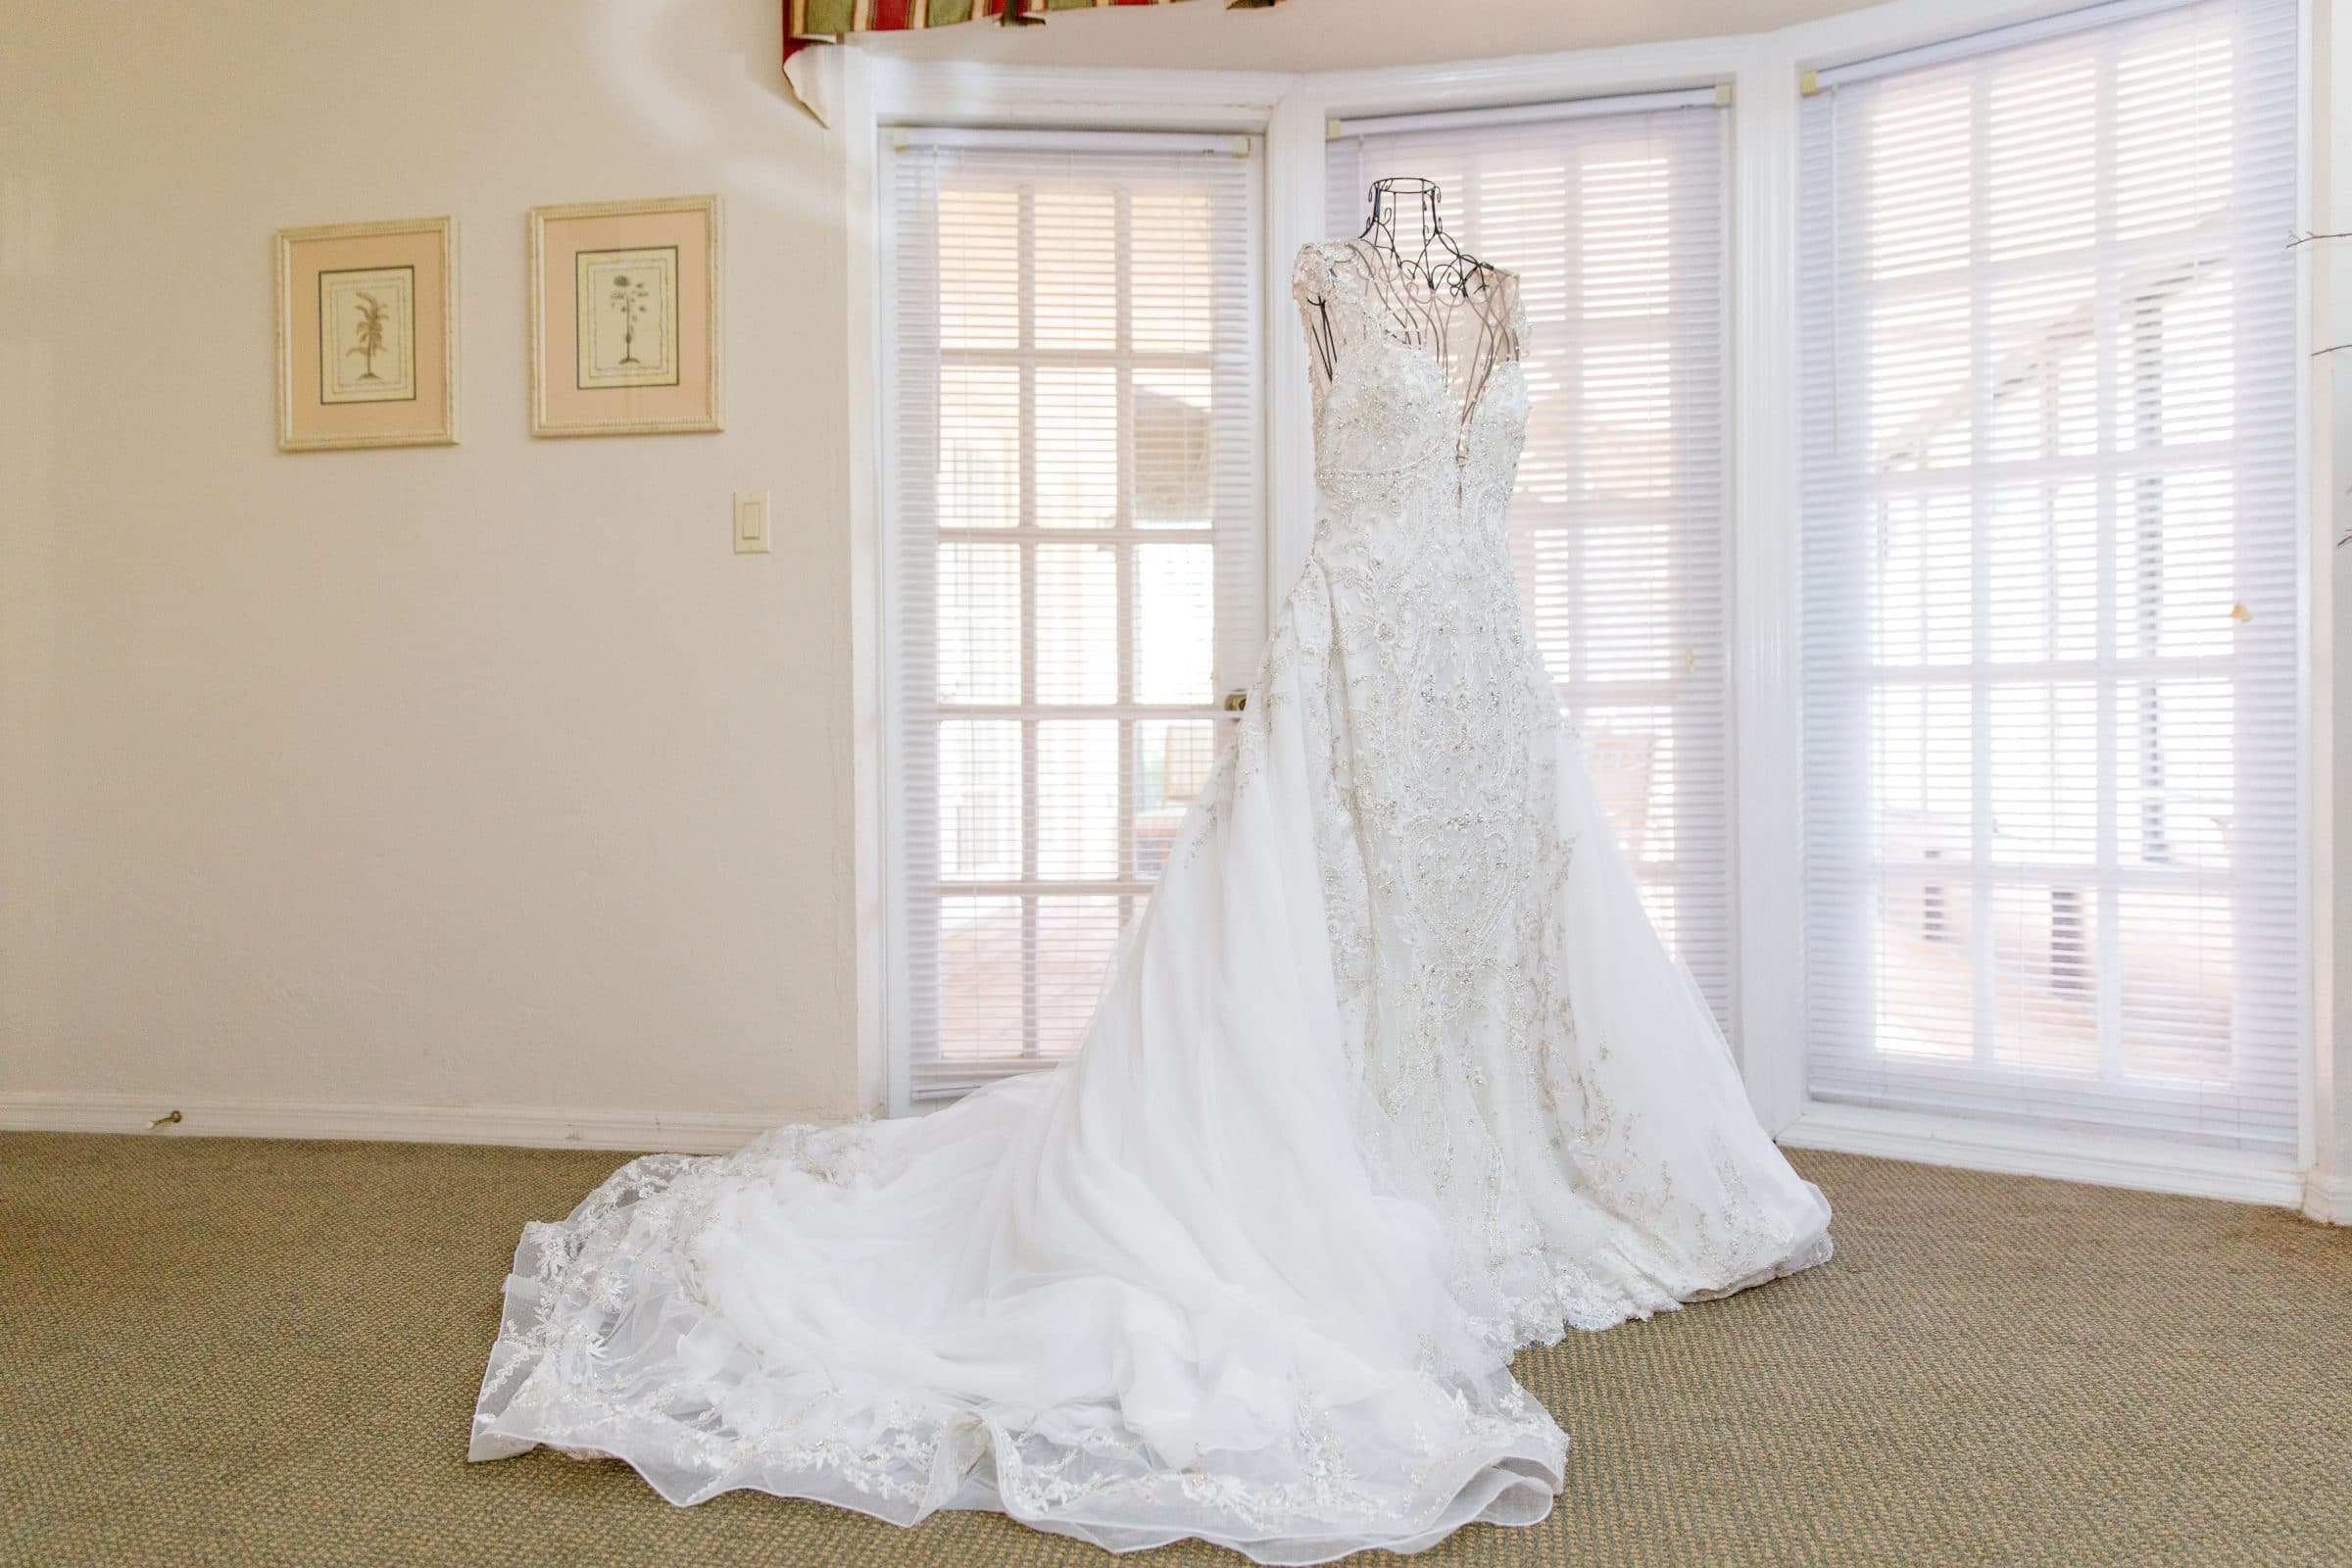 Wedding Dress hanging next to window in villa